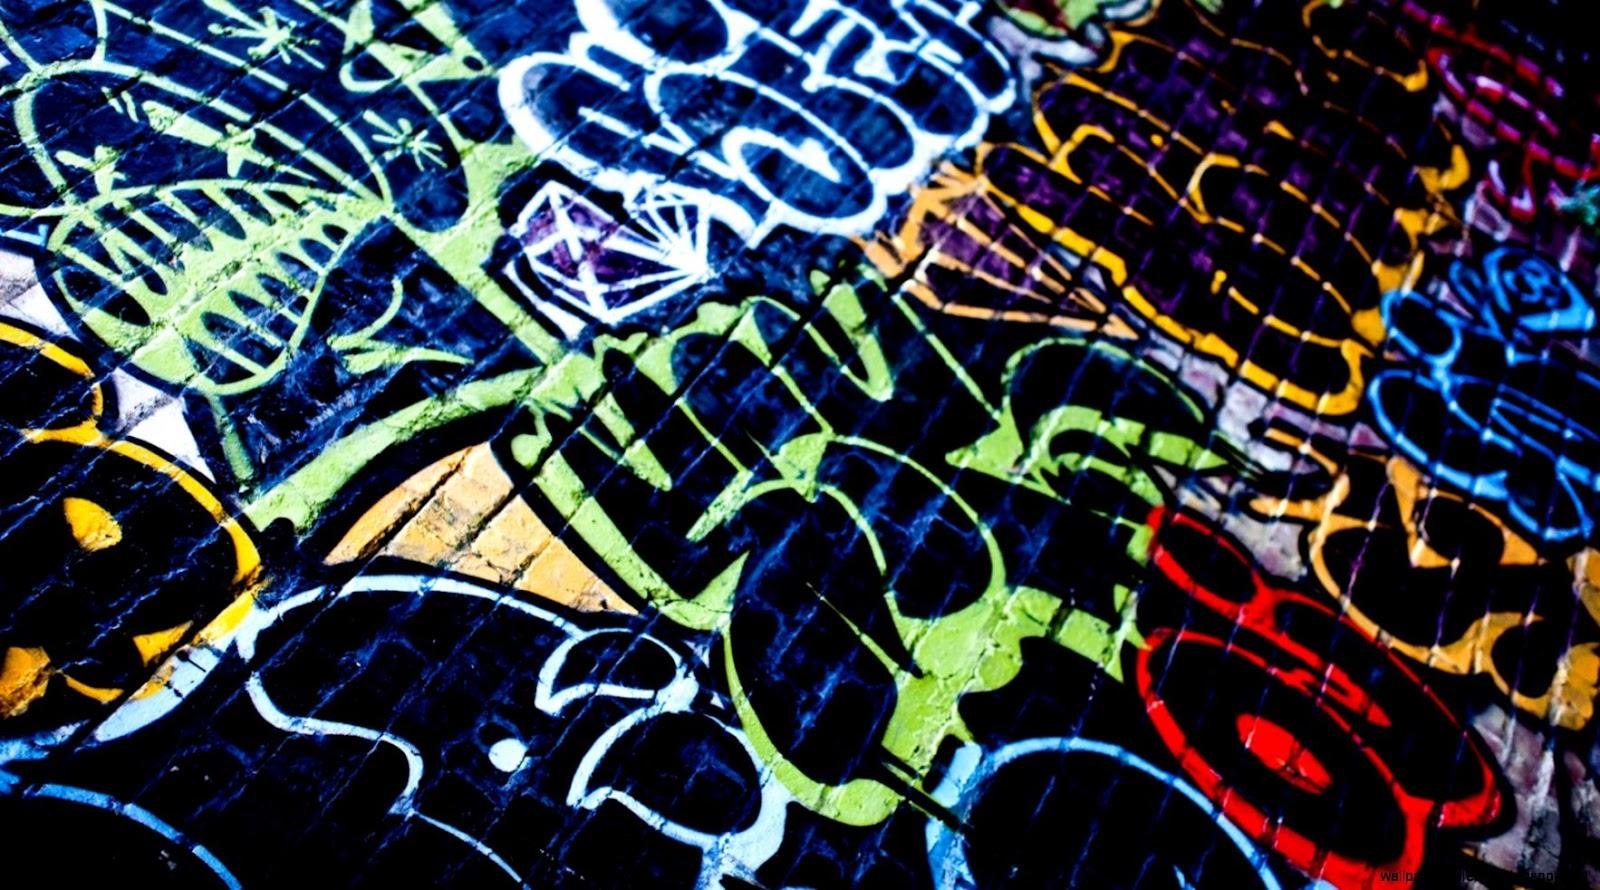 Must see Wallpaper Mac Art - graffiti-art-wallpaper-mac  Snapshot_452690.jpg